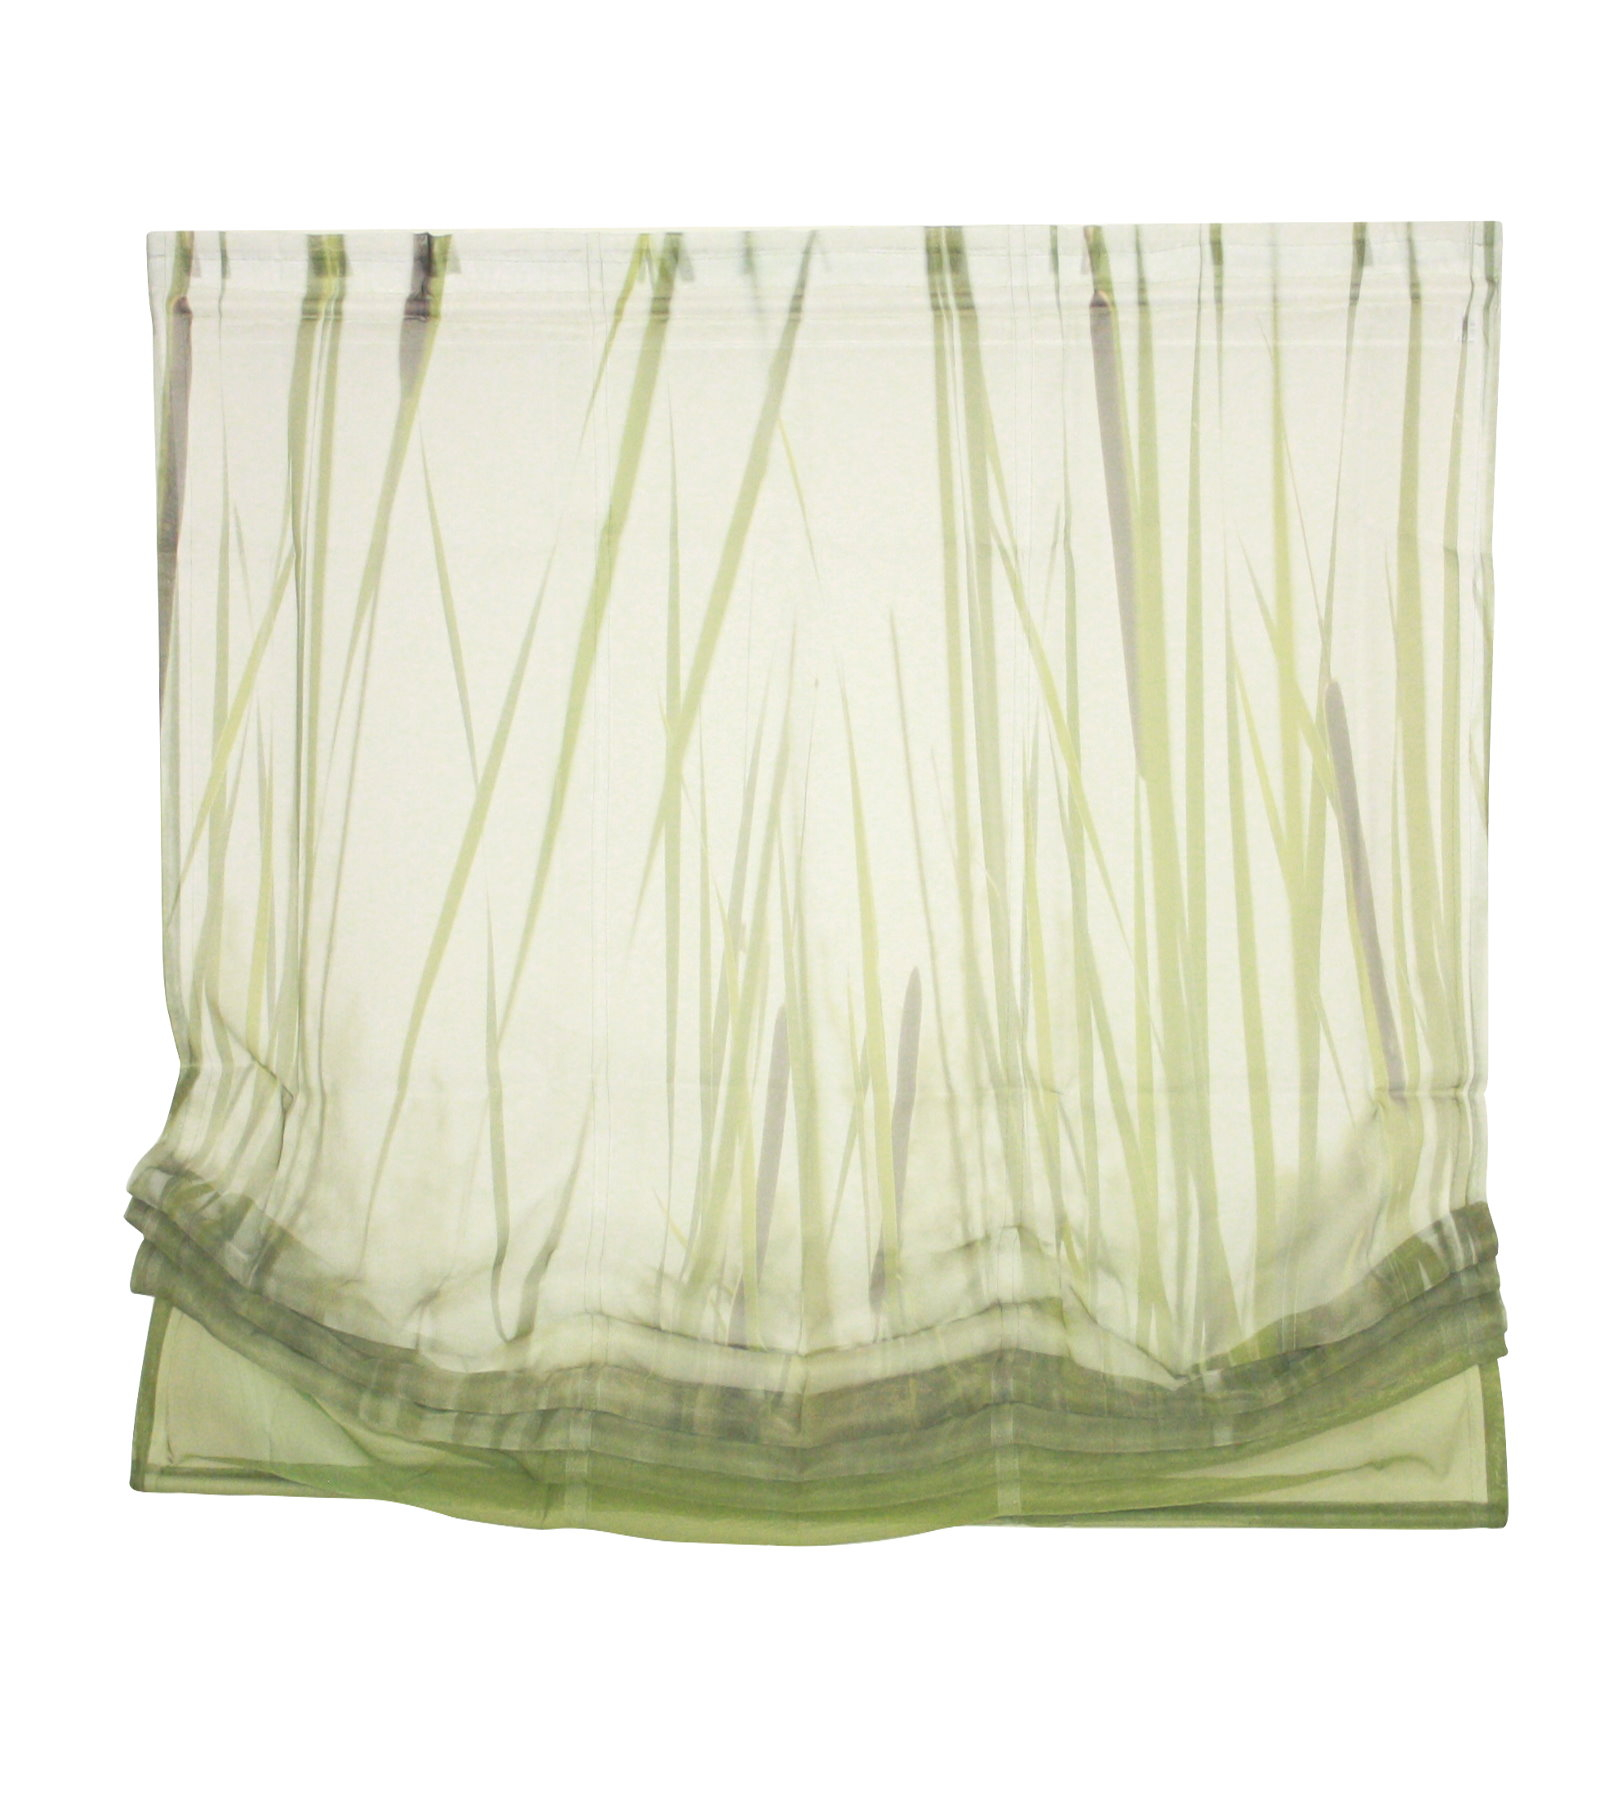 heine raffrollo 120x140 cm fenster rollo plissee. Black Bedroom Furniture Sets. Home Design Ideas